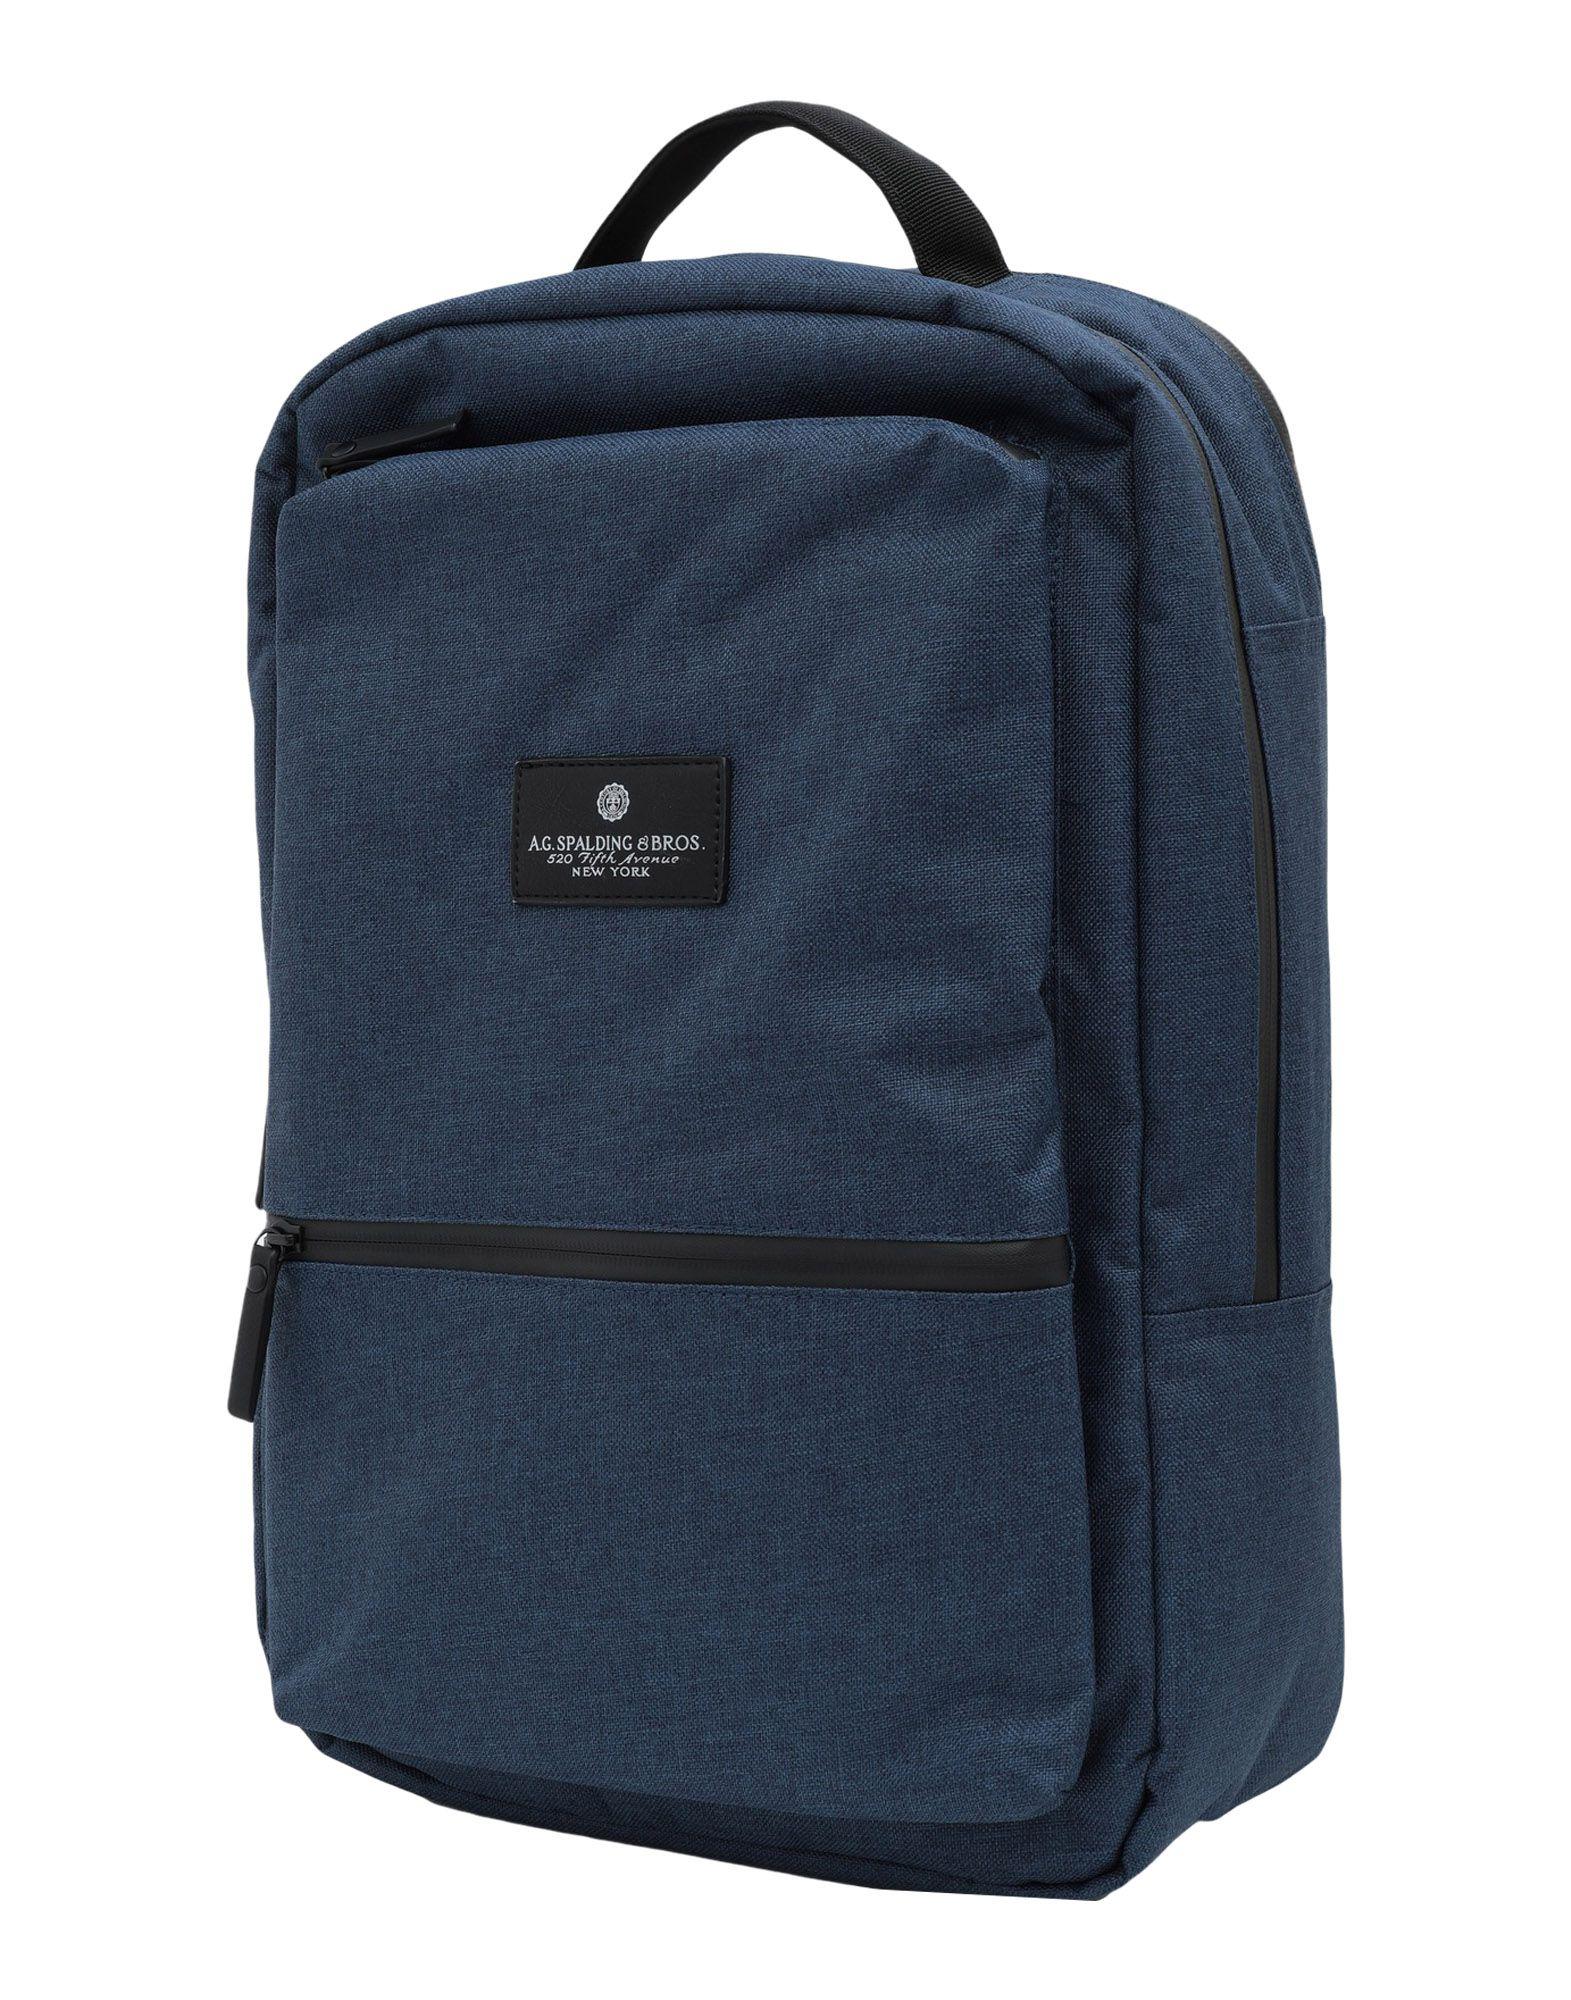 A.G. SPALDING & BROS. 520 FIFTH AVENUE New York Рюкзаки и сумки на пояс spalding